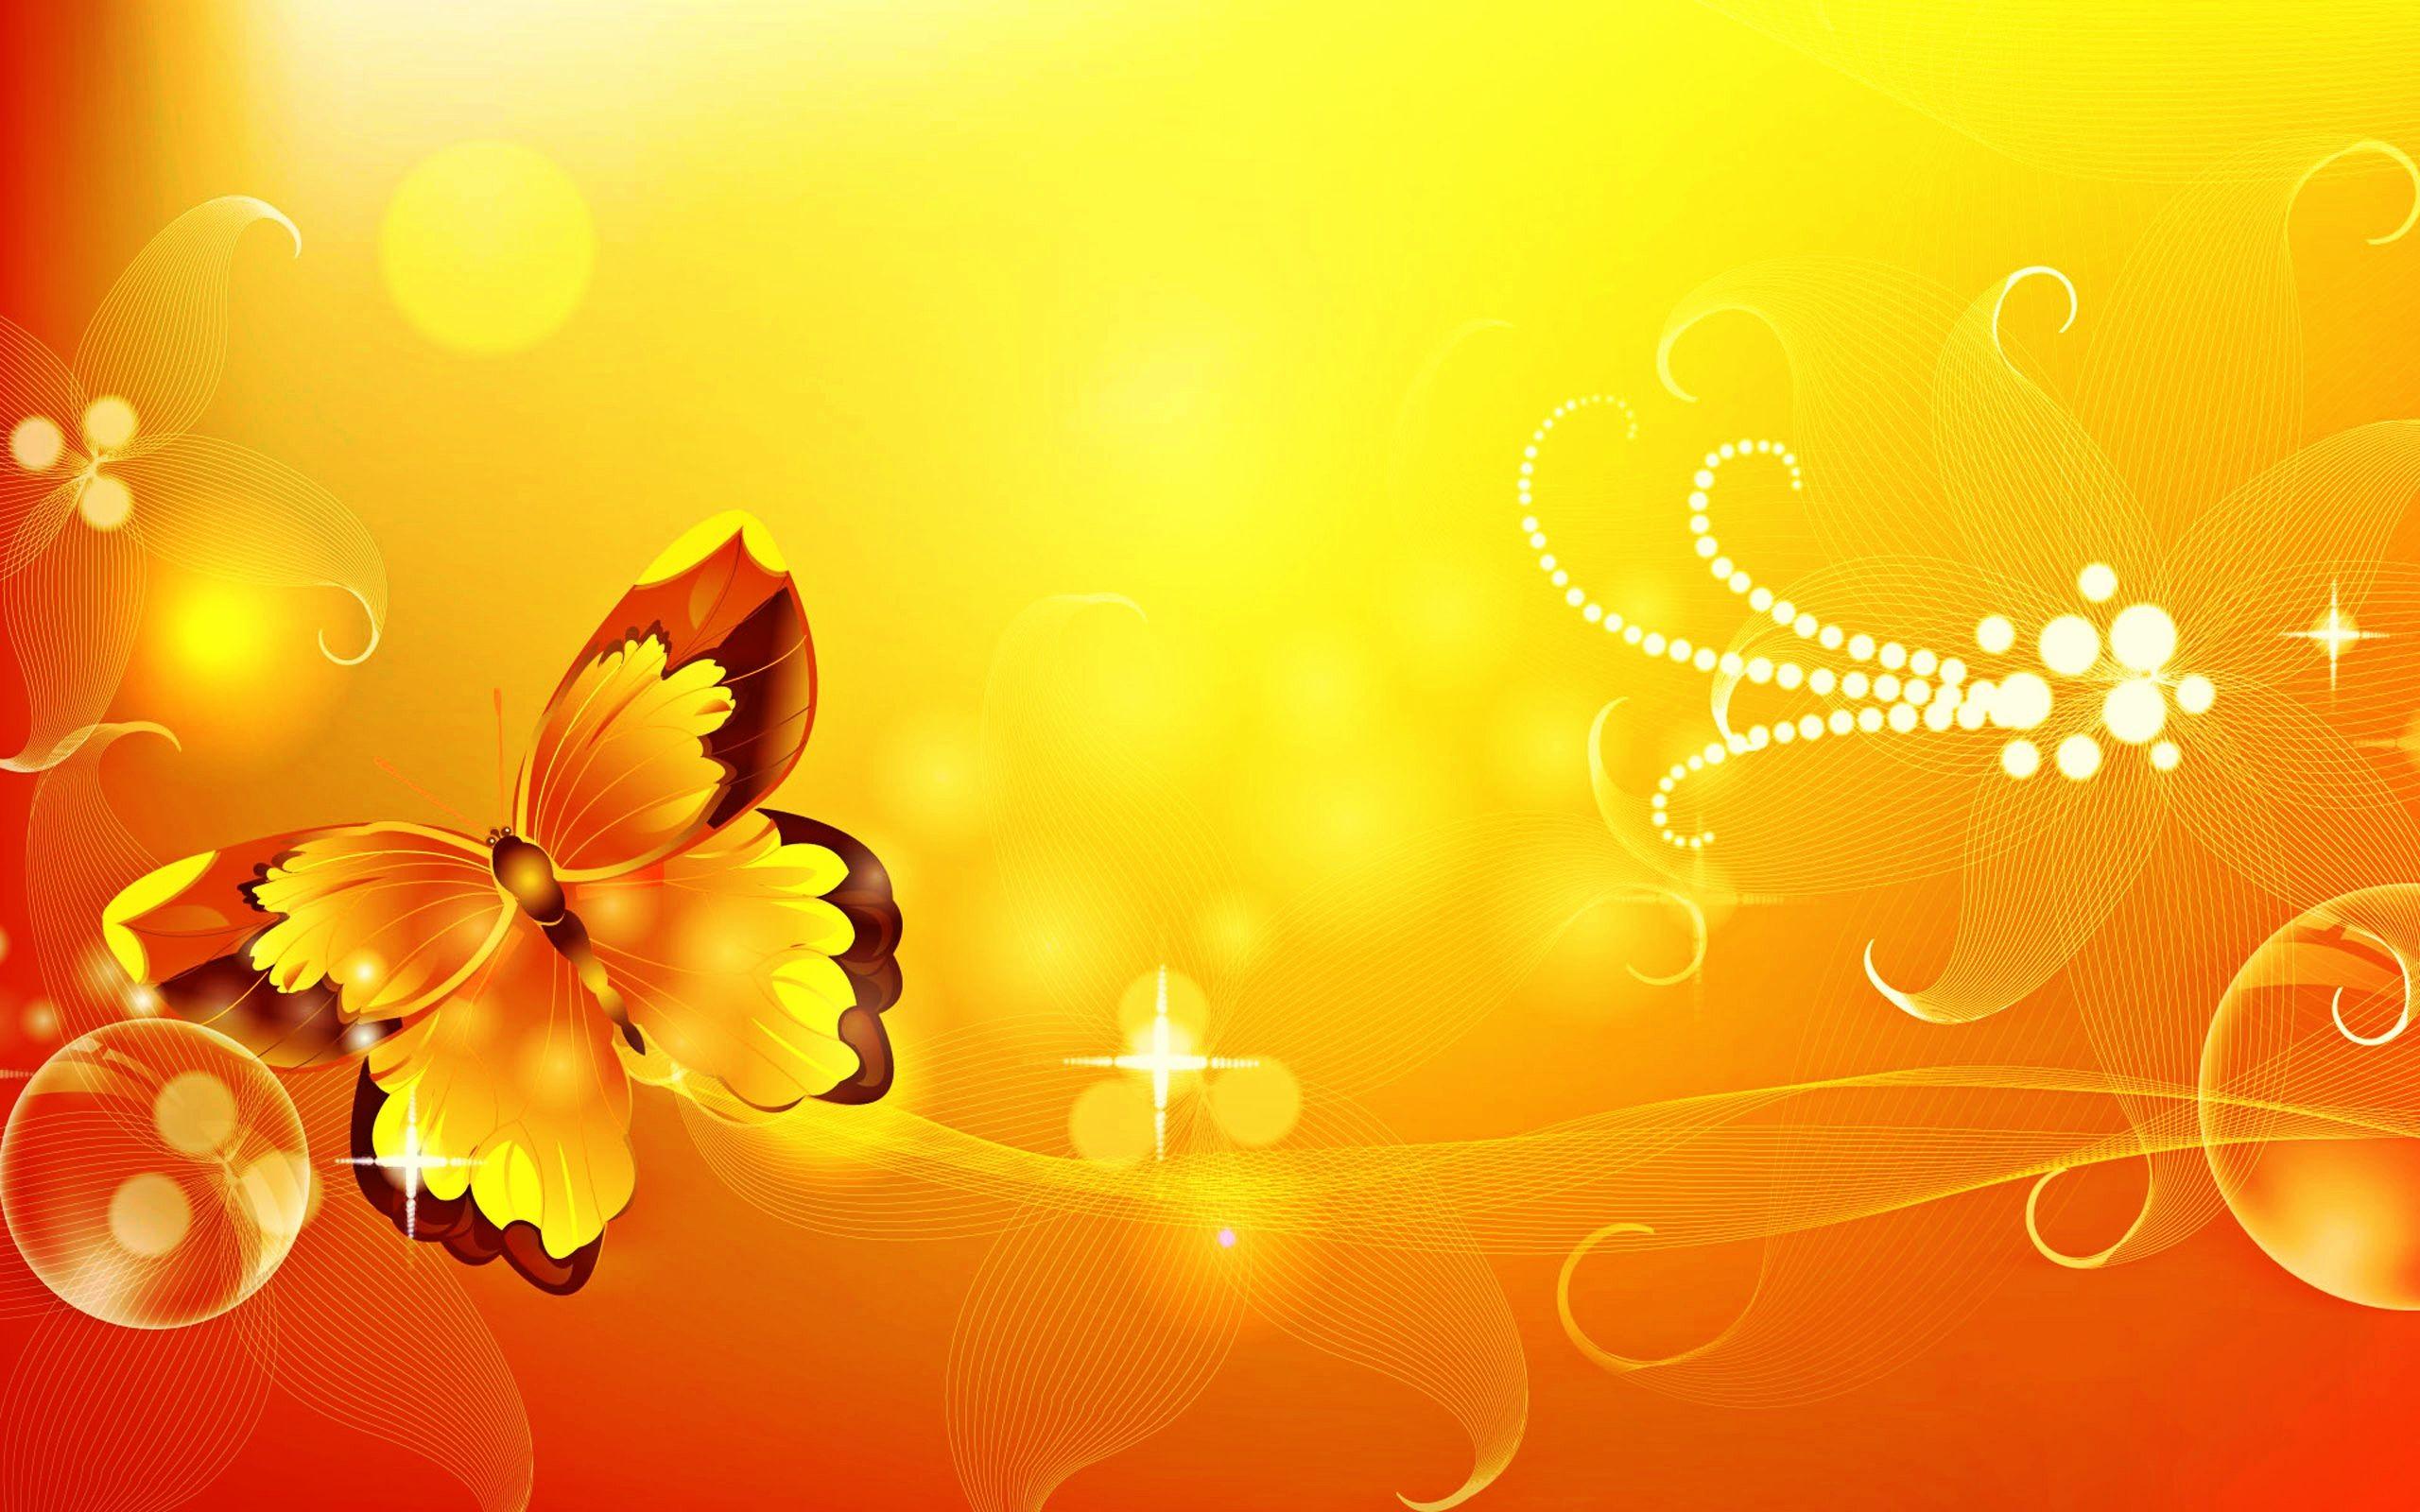 Graphic background download free beautiful hd - Graphic design desktop wallpaper hd ...